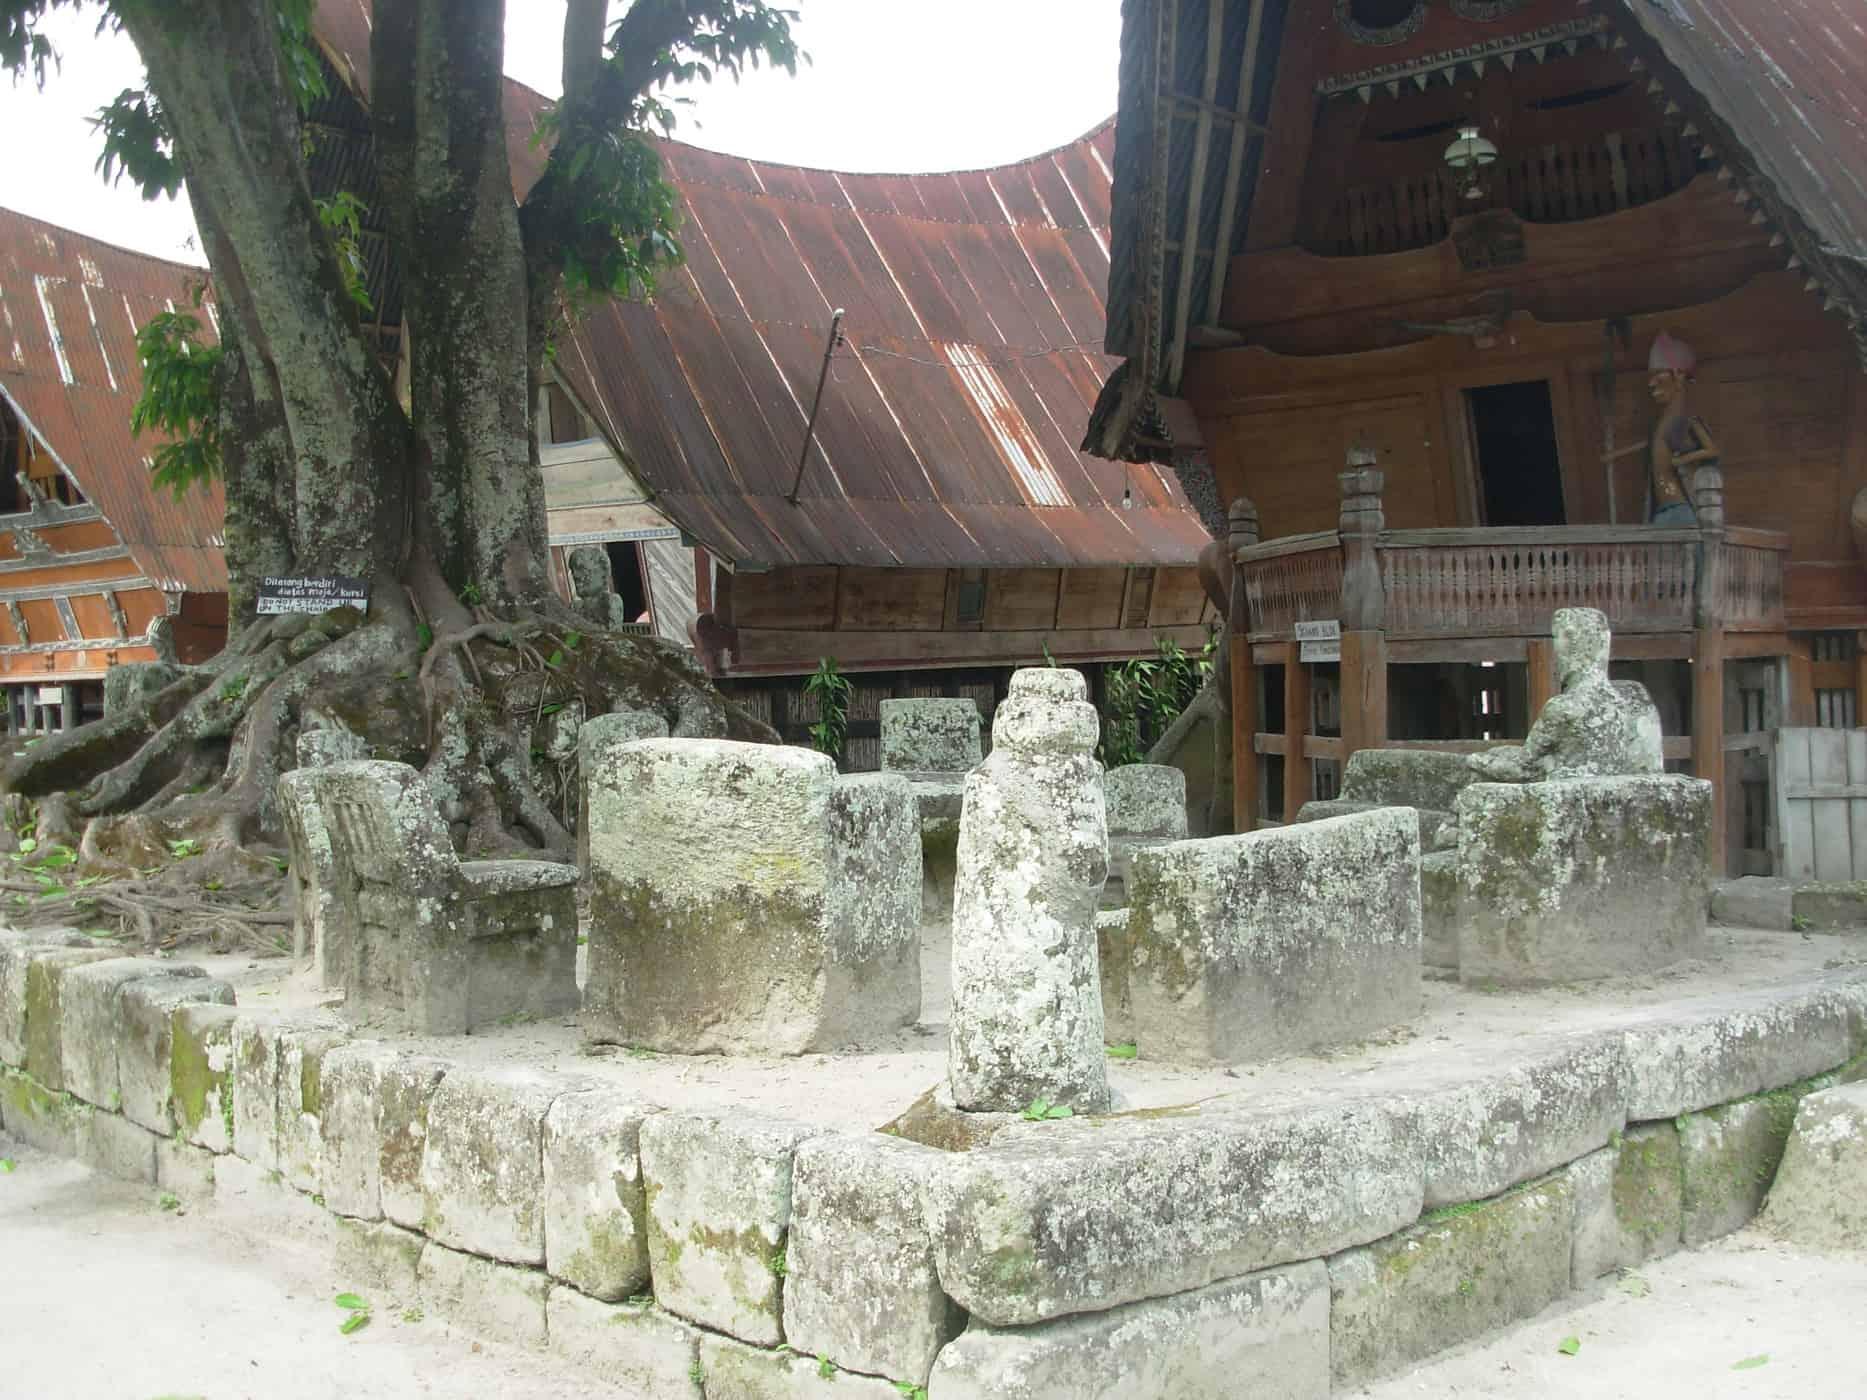 The tribal village Ambarita, Pulau Samosir, Sumatra.